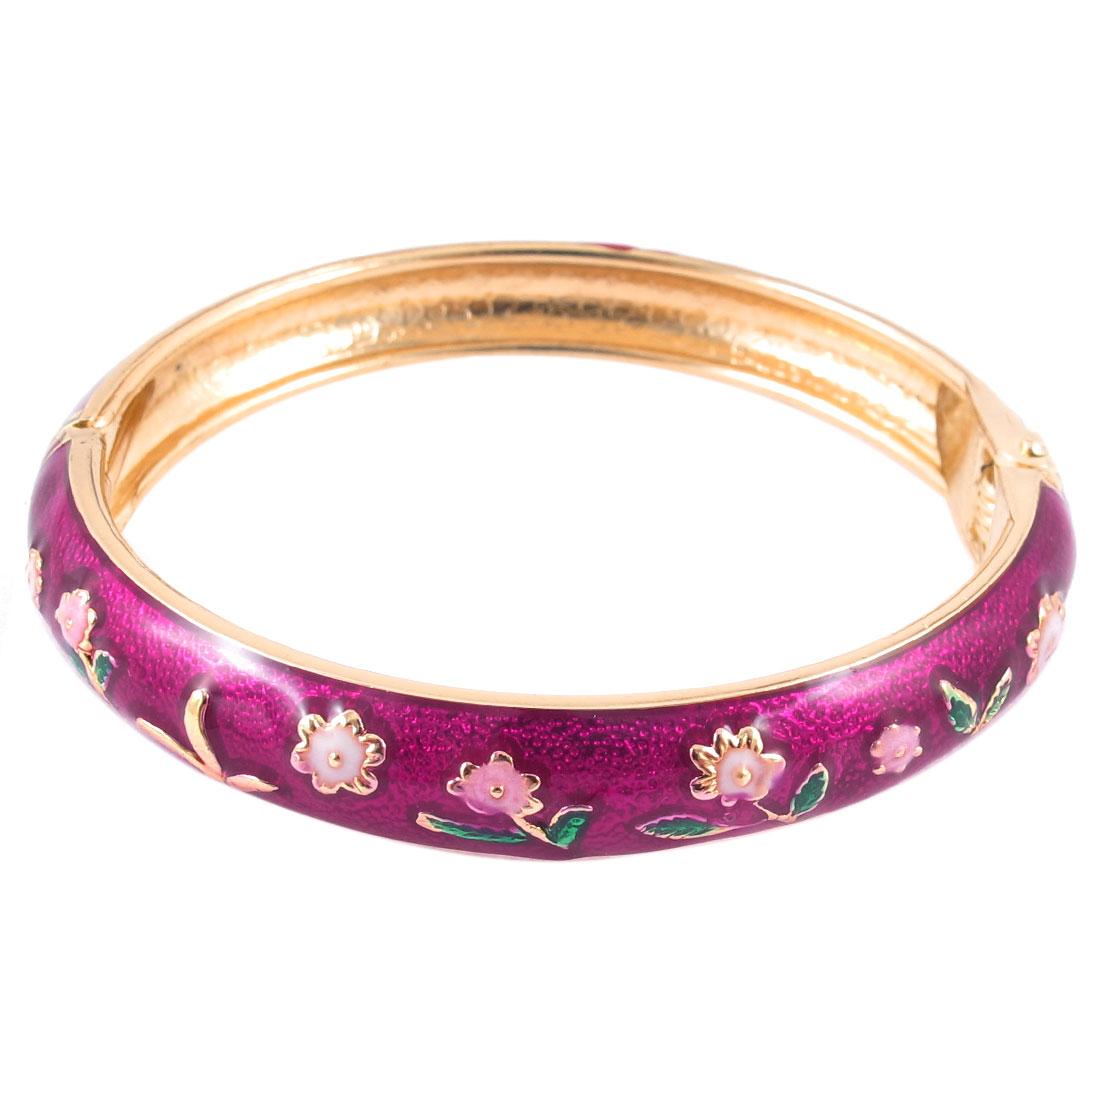 Girls Spring Closure Floral Enamel Round Bracelet Bangle Wrist Decoration Fushcia